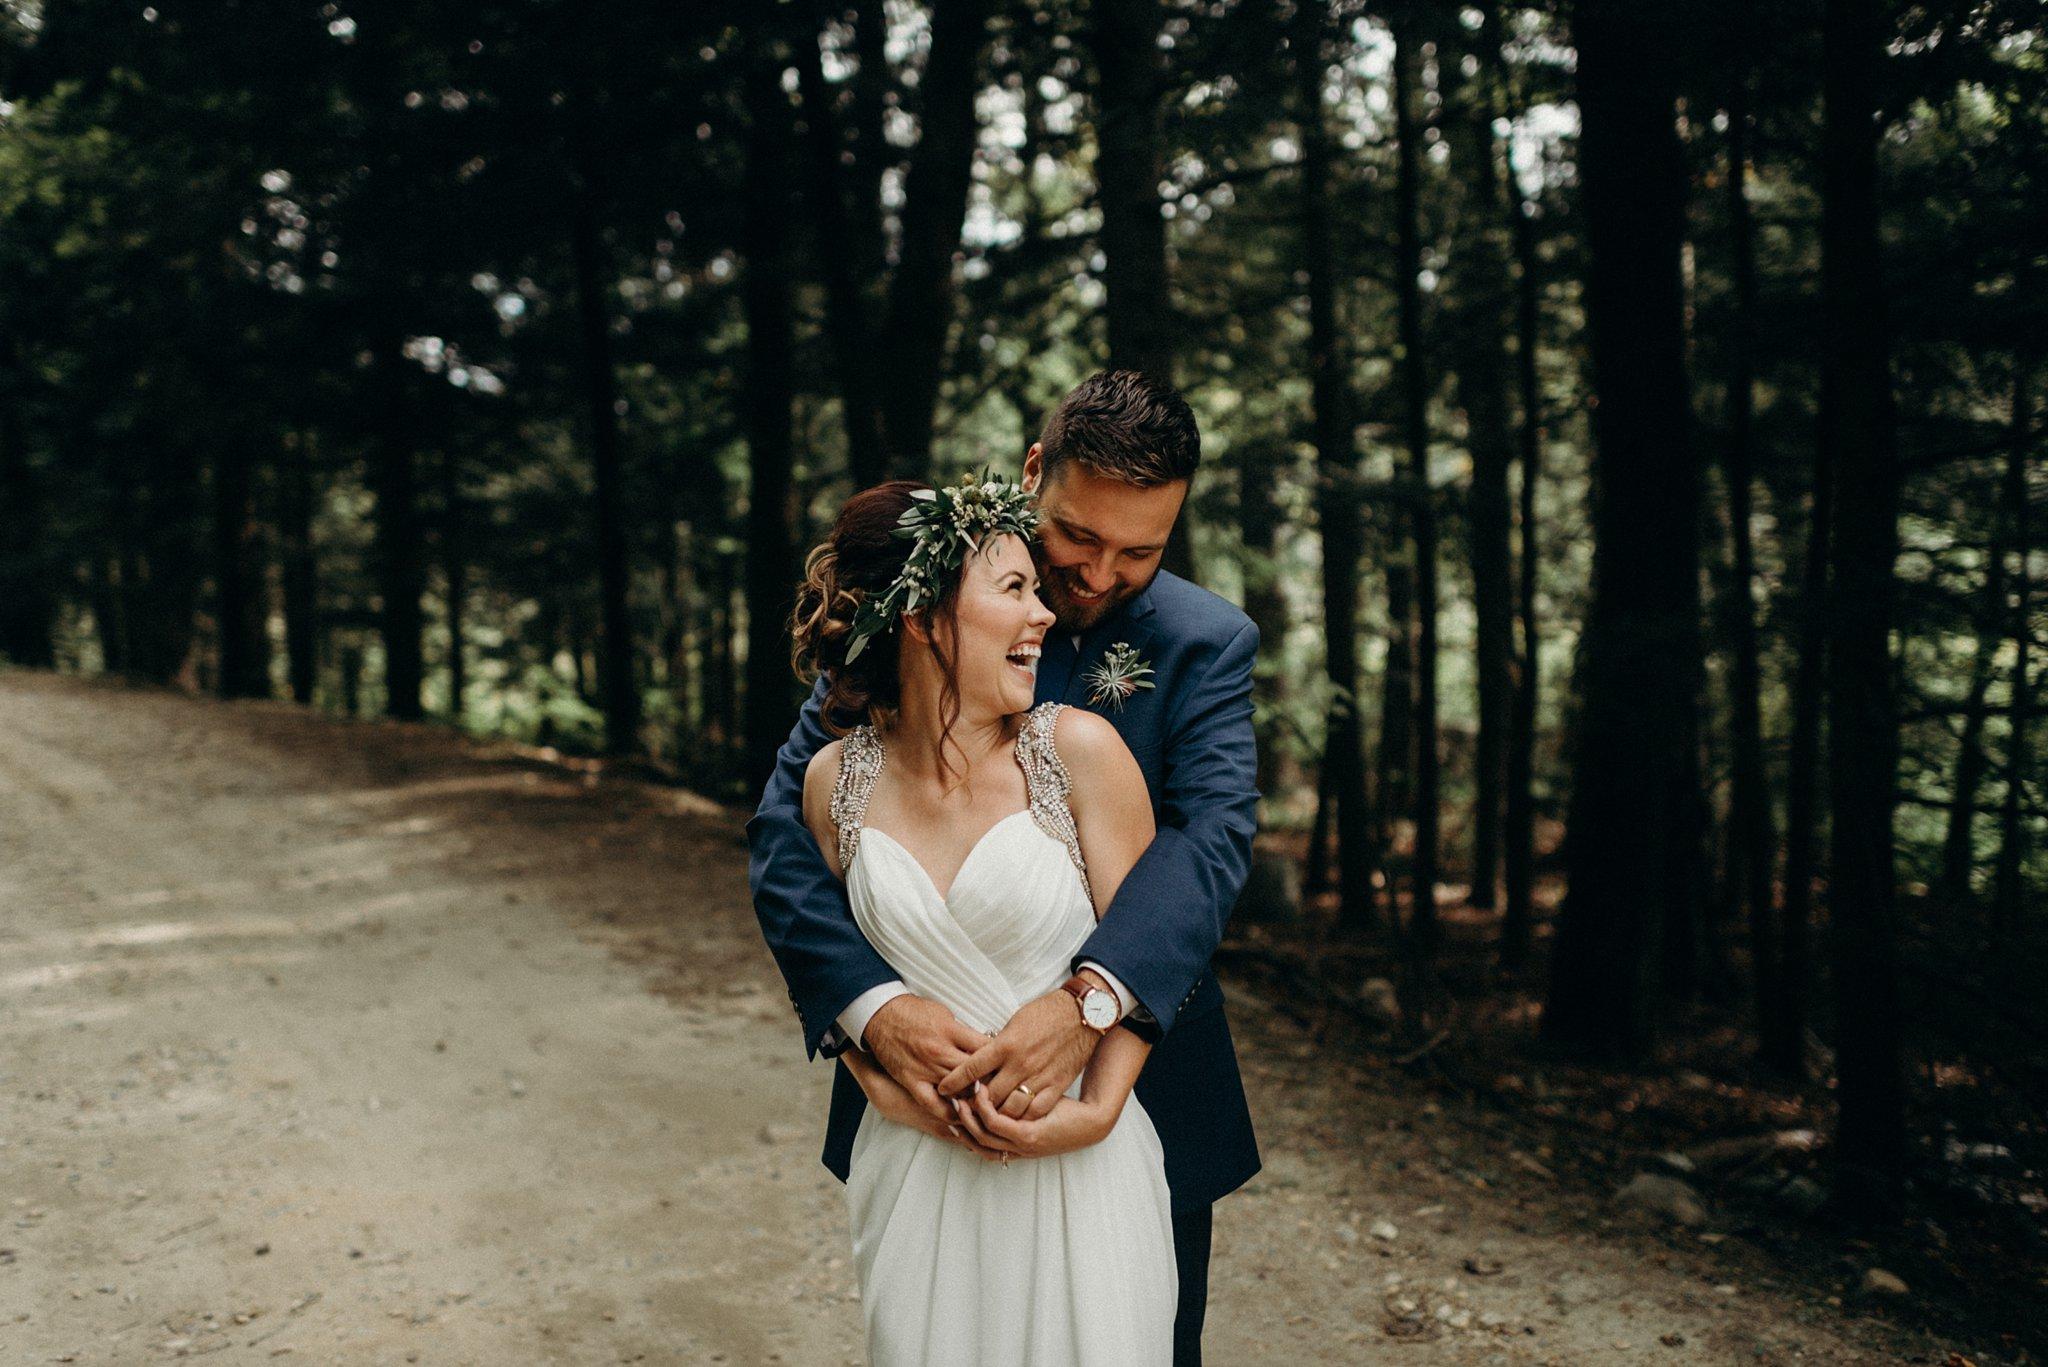 kaihla_tonai_intimate_wedding_elopement_photographer_6582.jpg